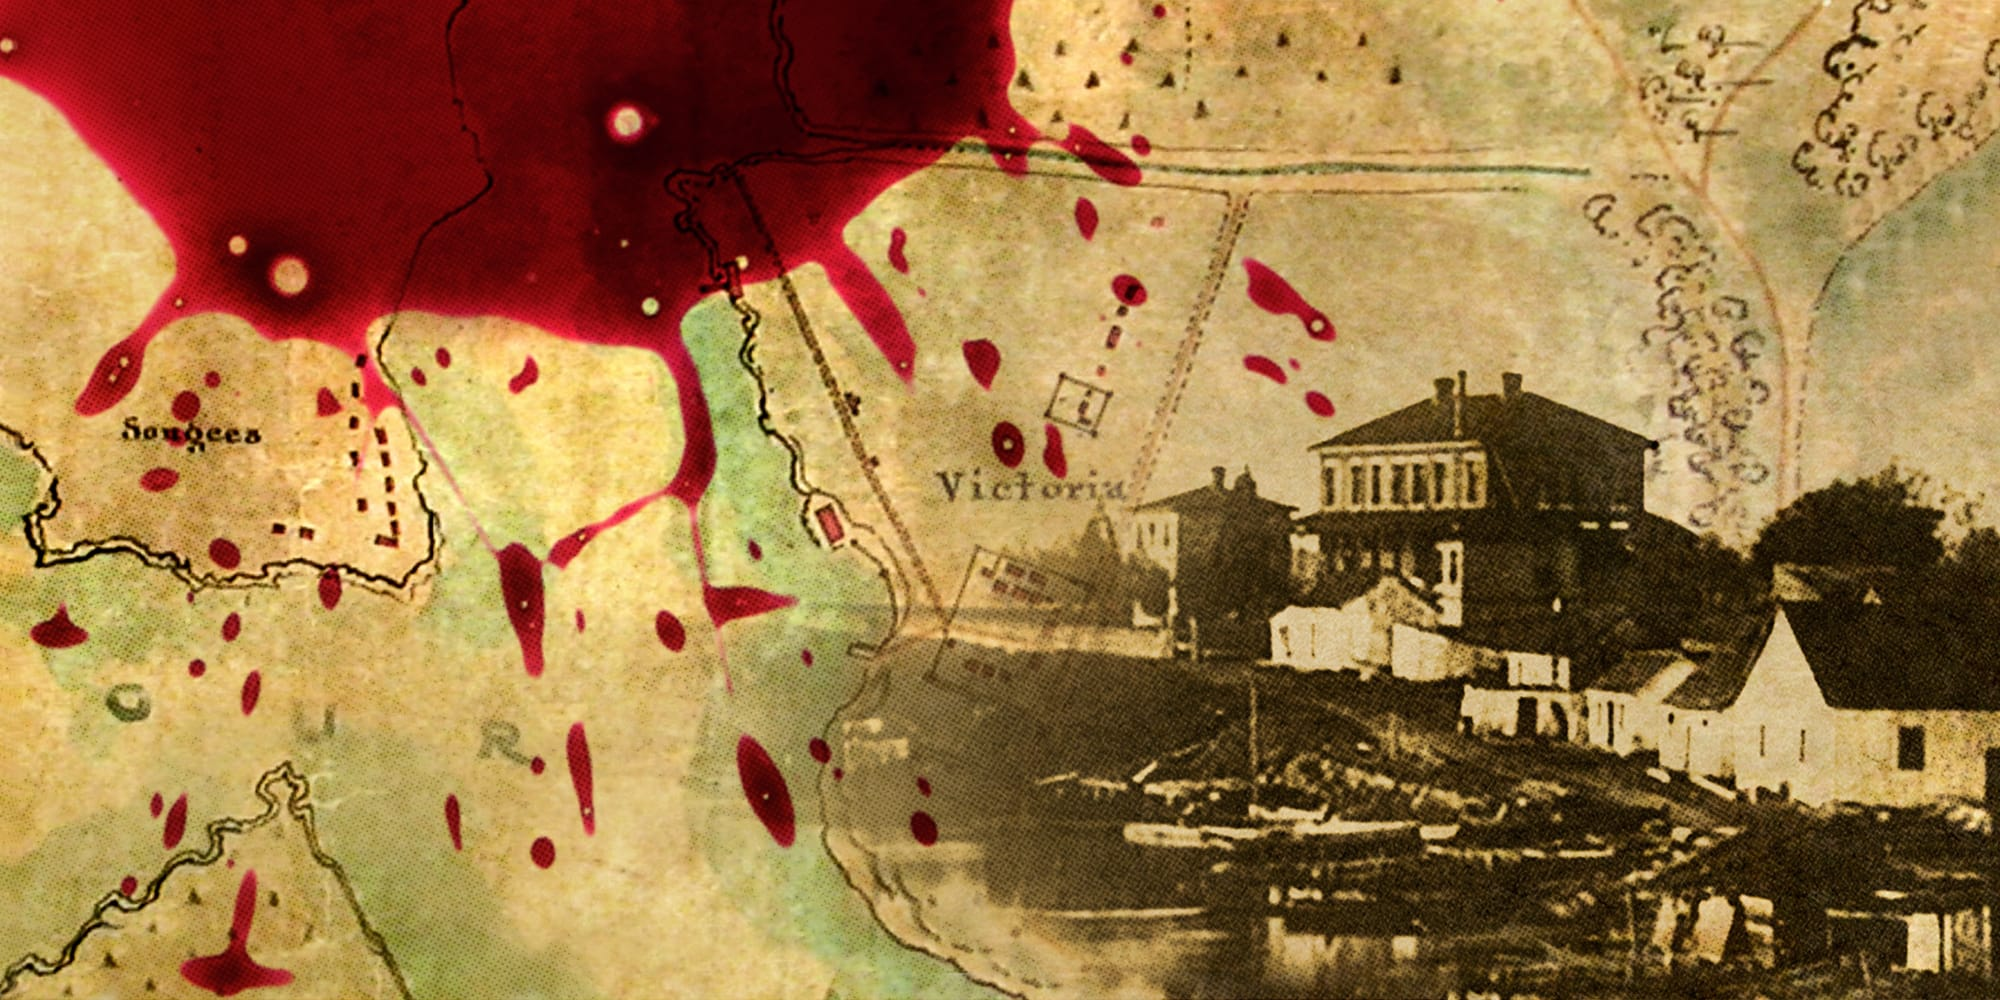 Canada's Jack the Ripper